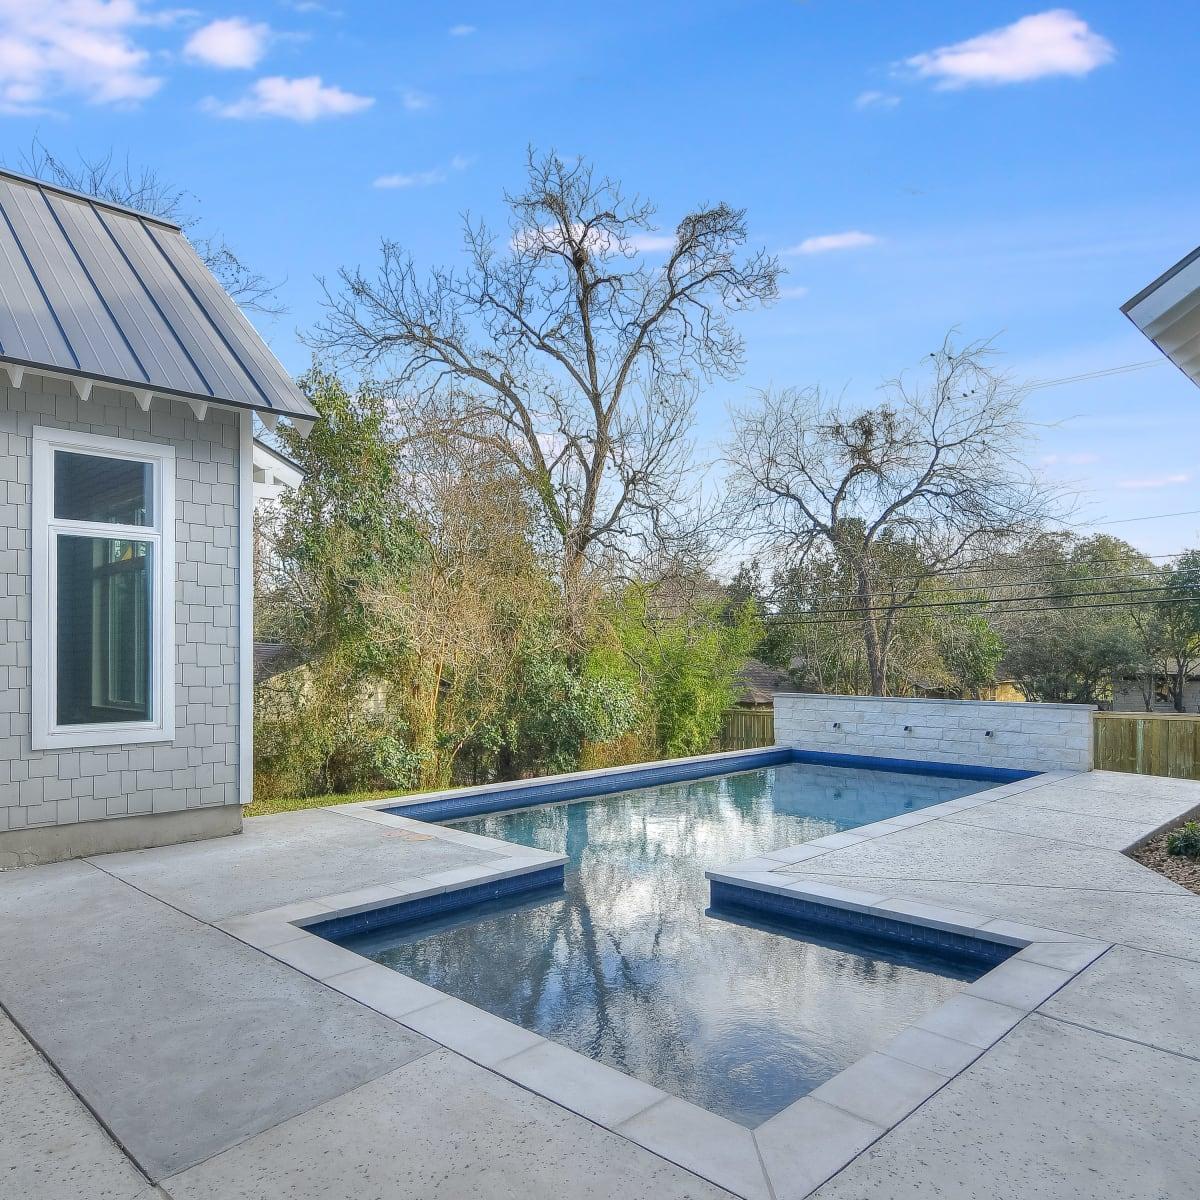 1016 Garraty, San Antonio, house, for sale pool